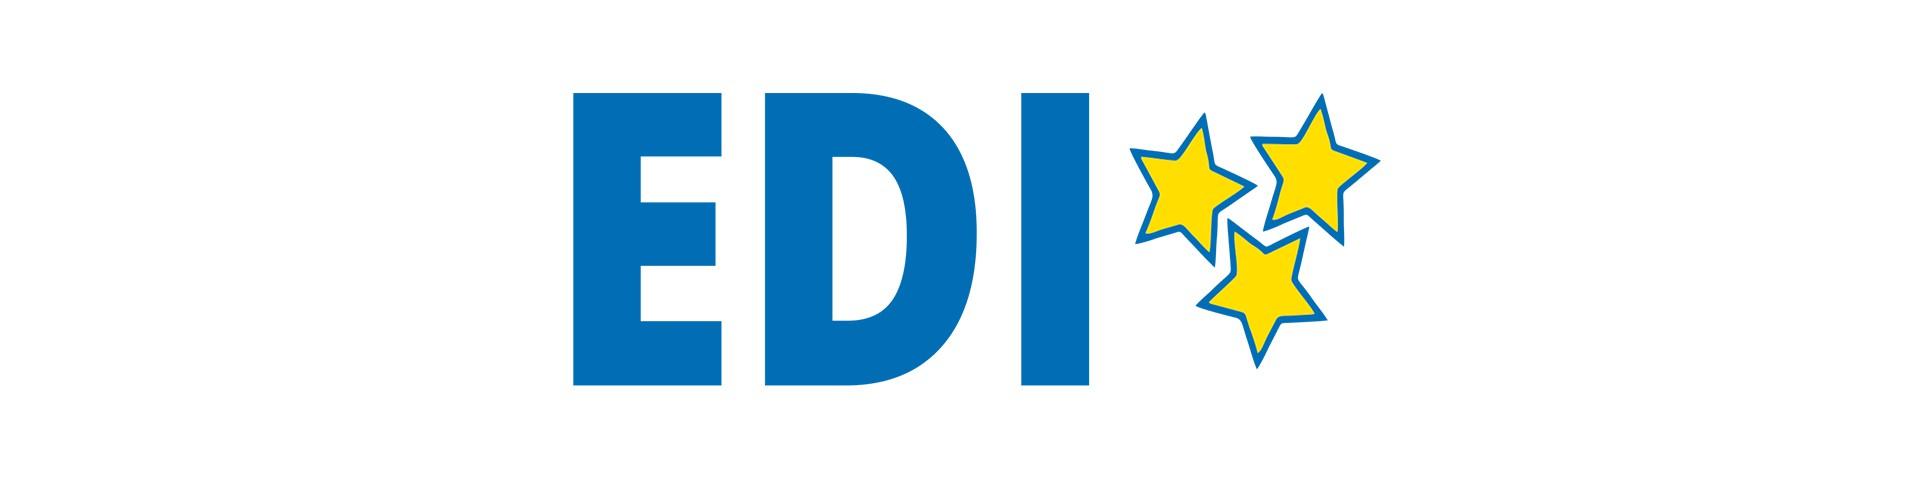 EDI logo for EGU's General Assembly (Credit: EGU)